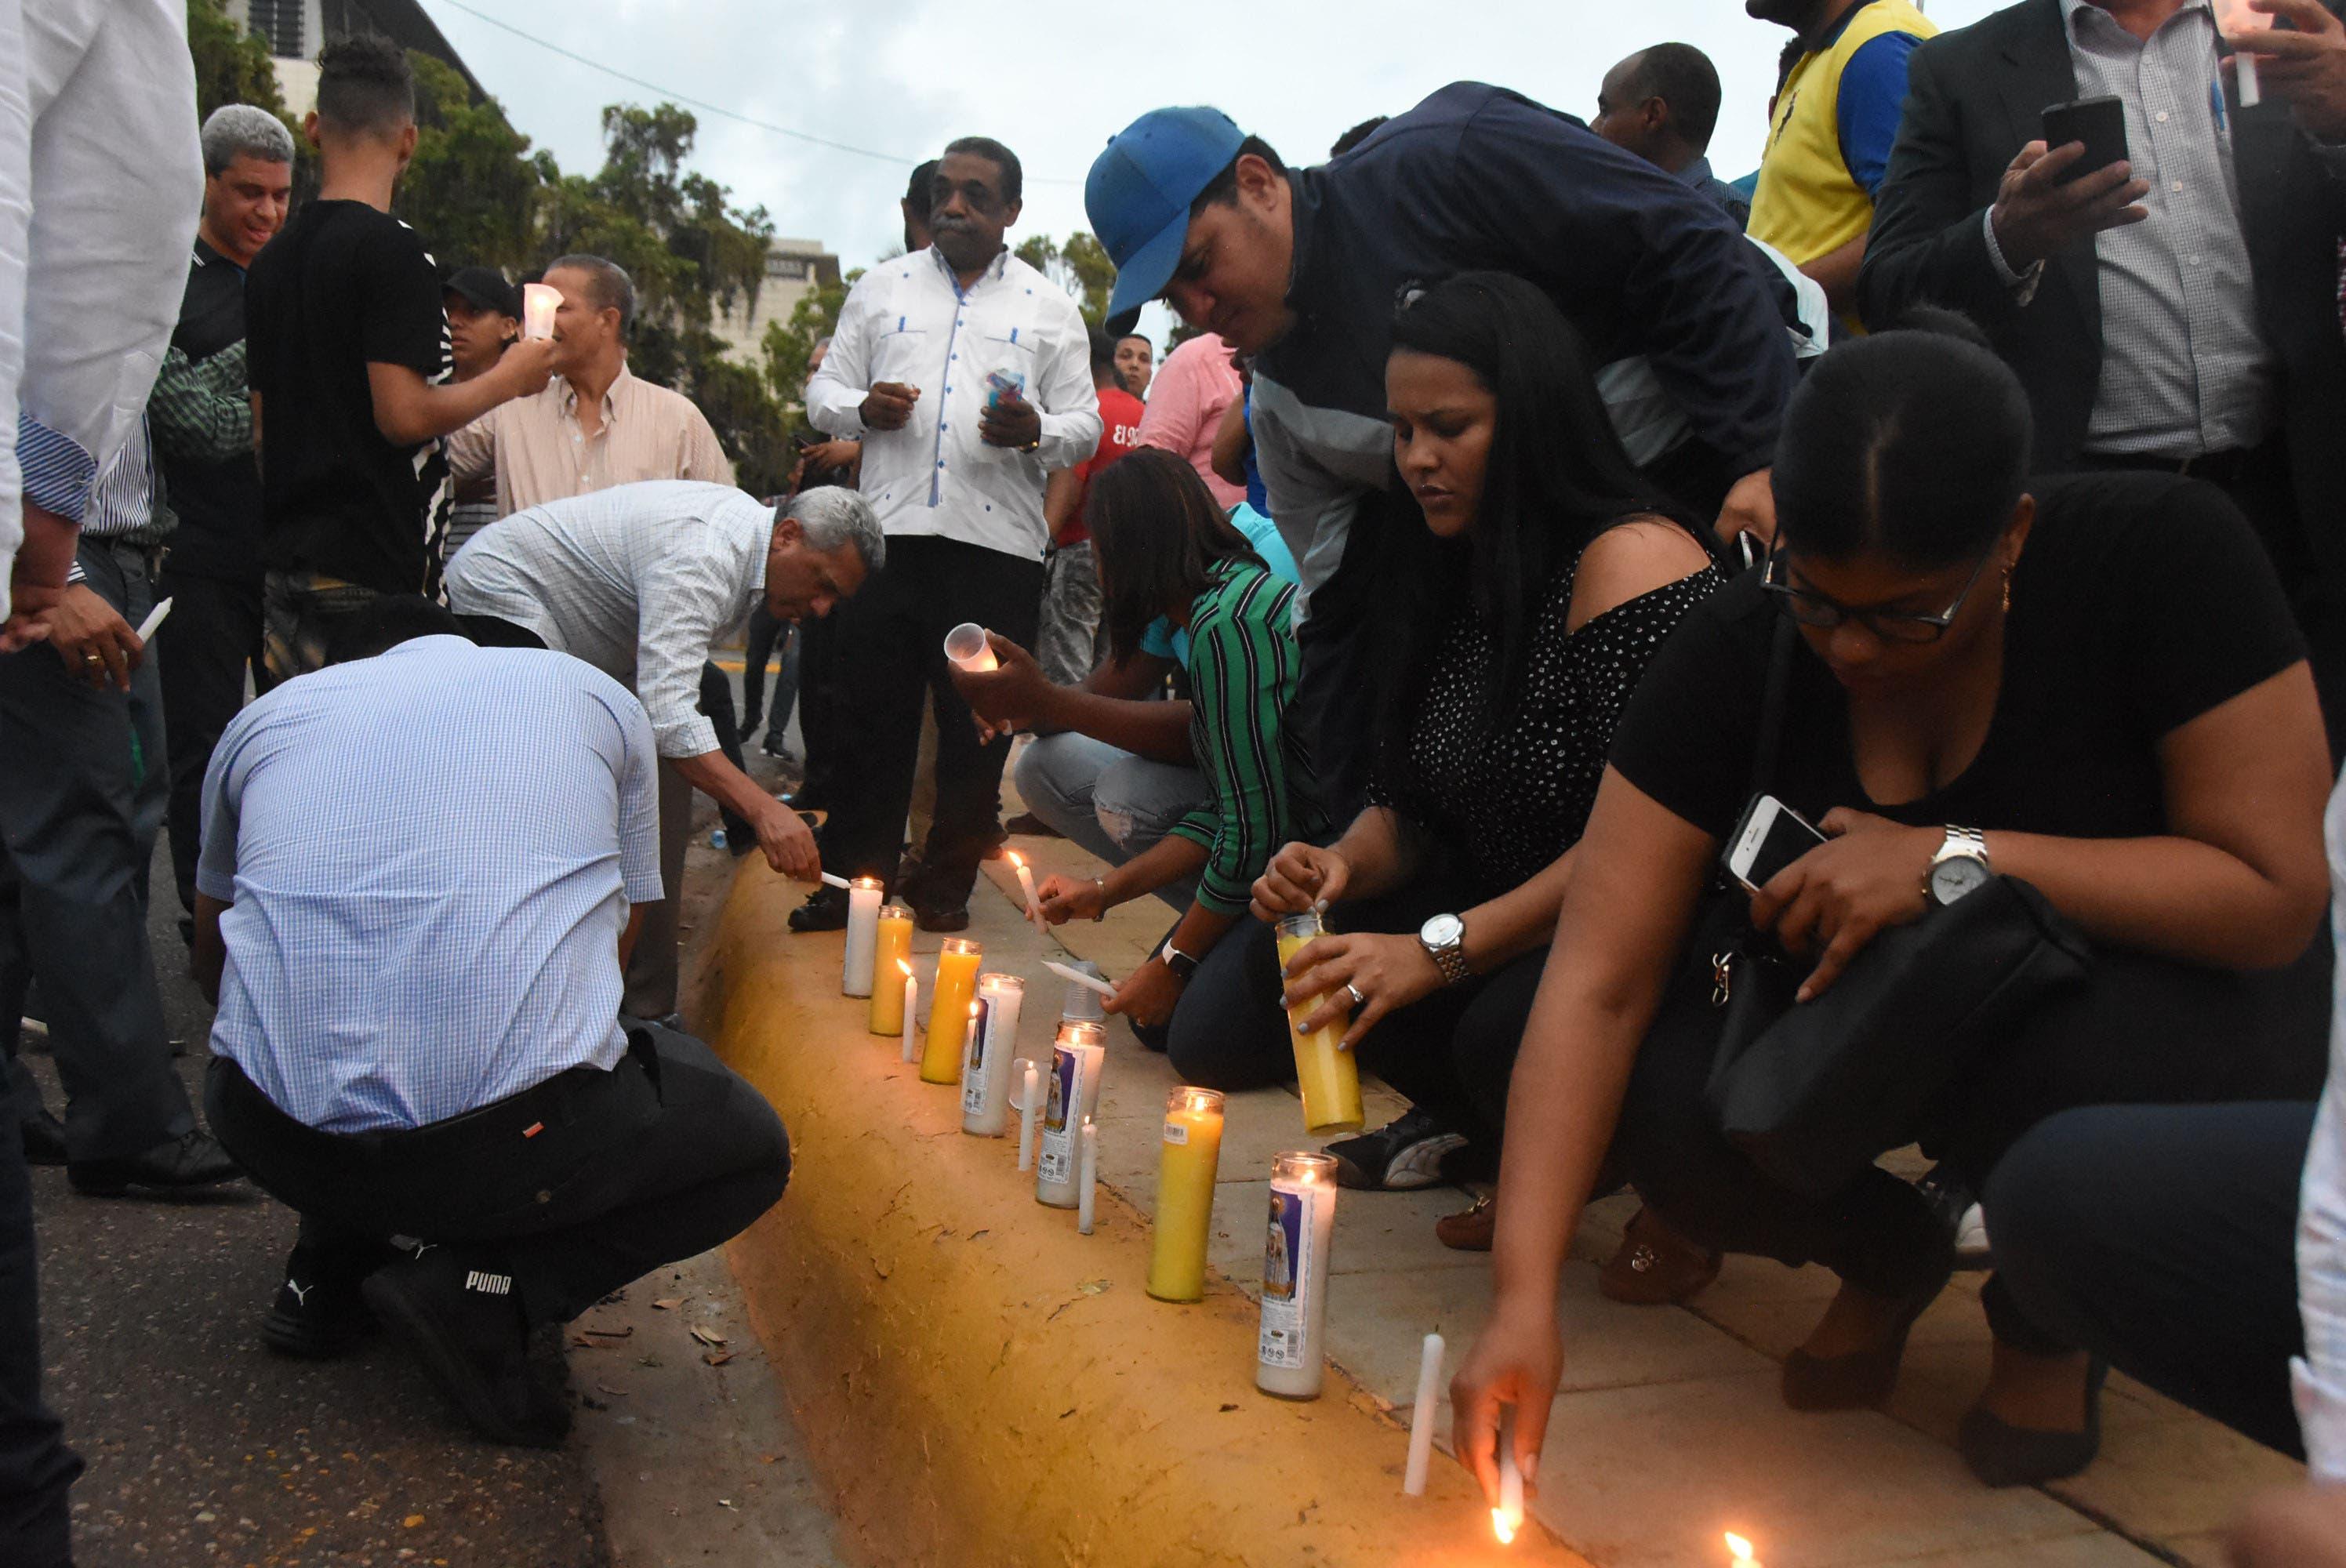 2. Los manifestantes encendieron velas